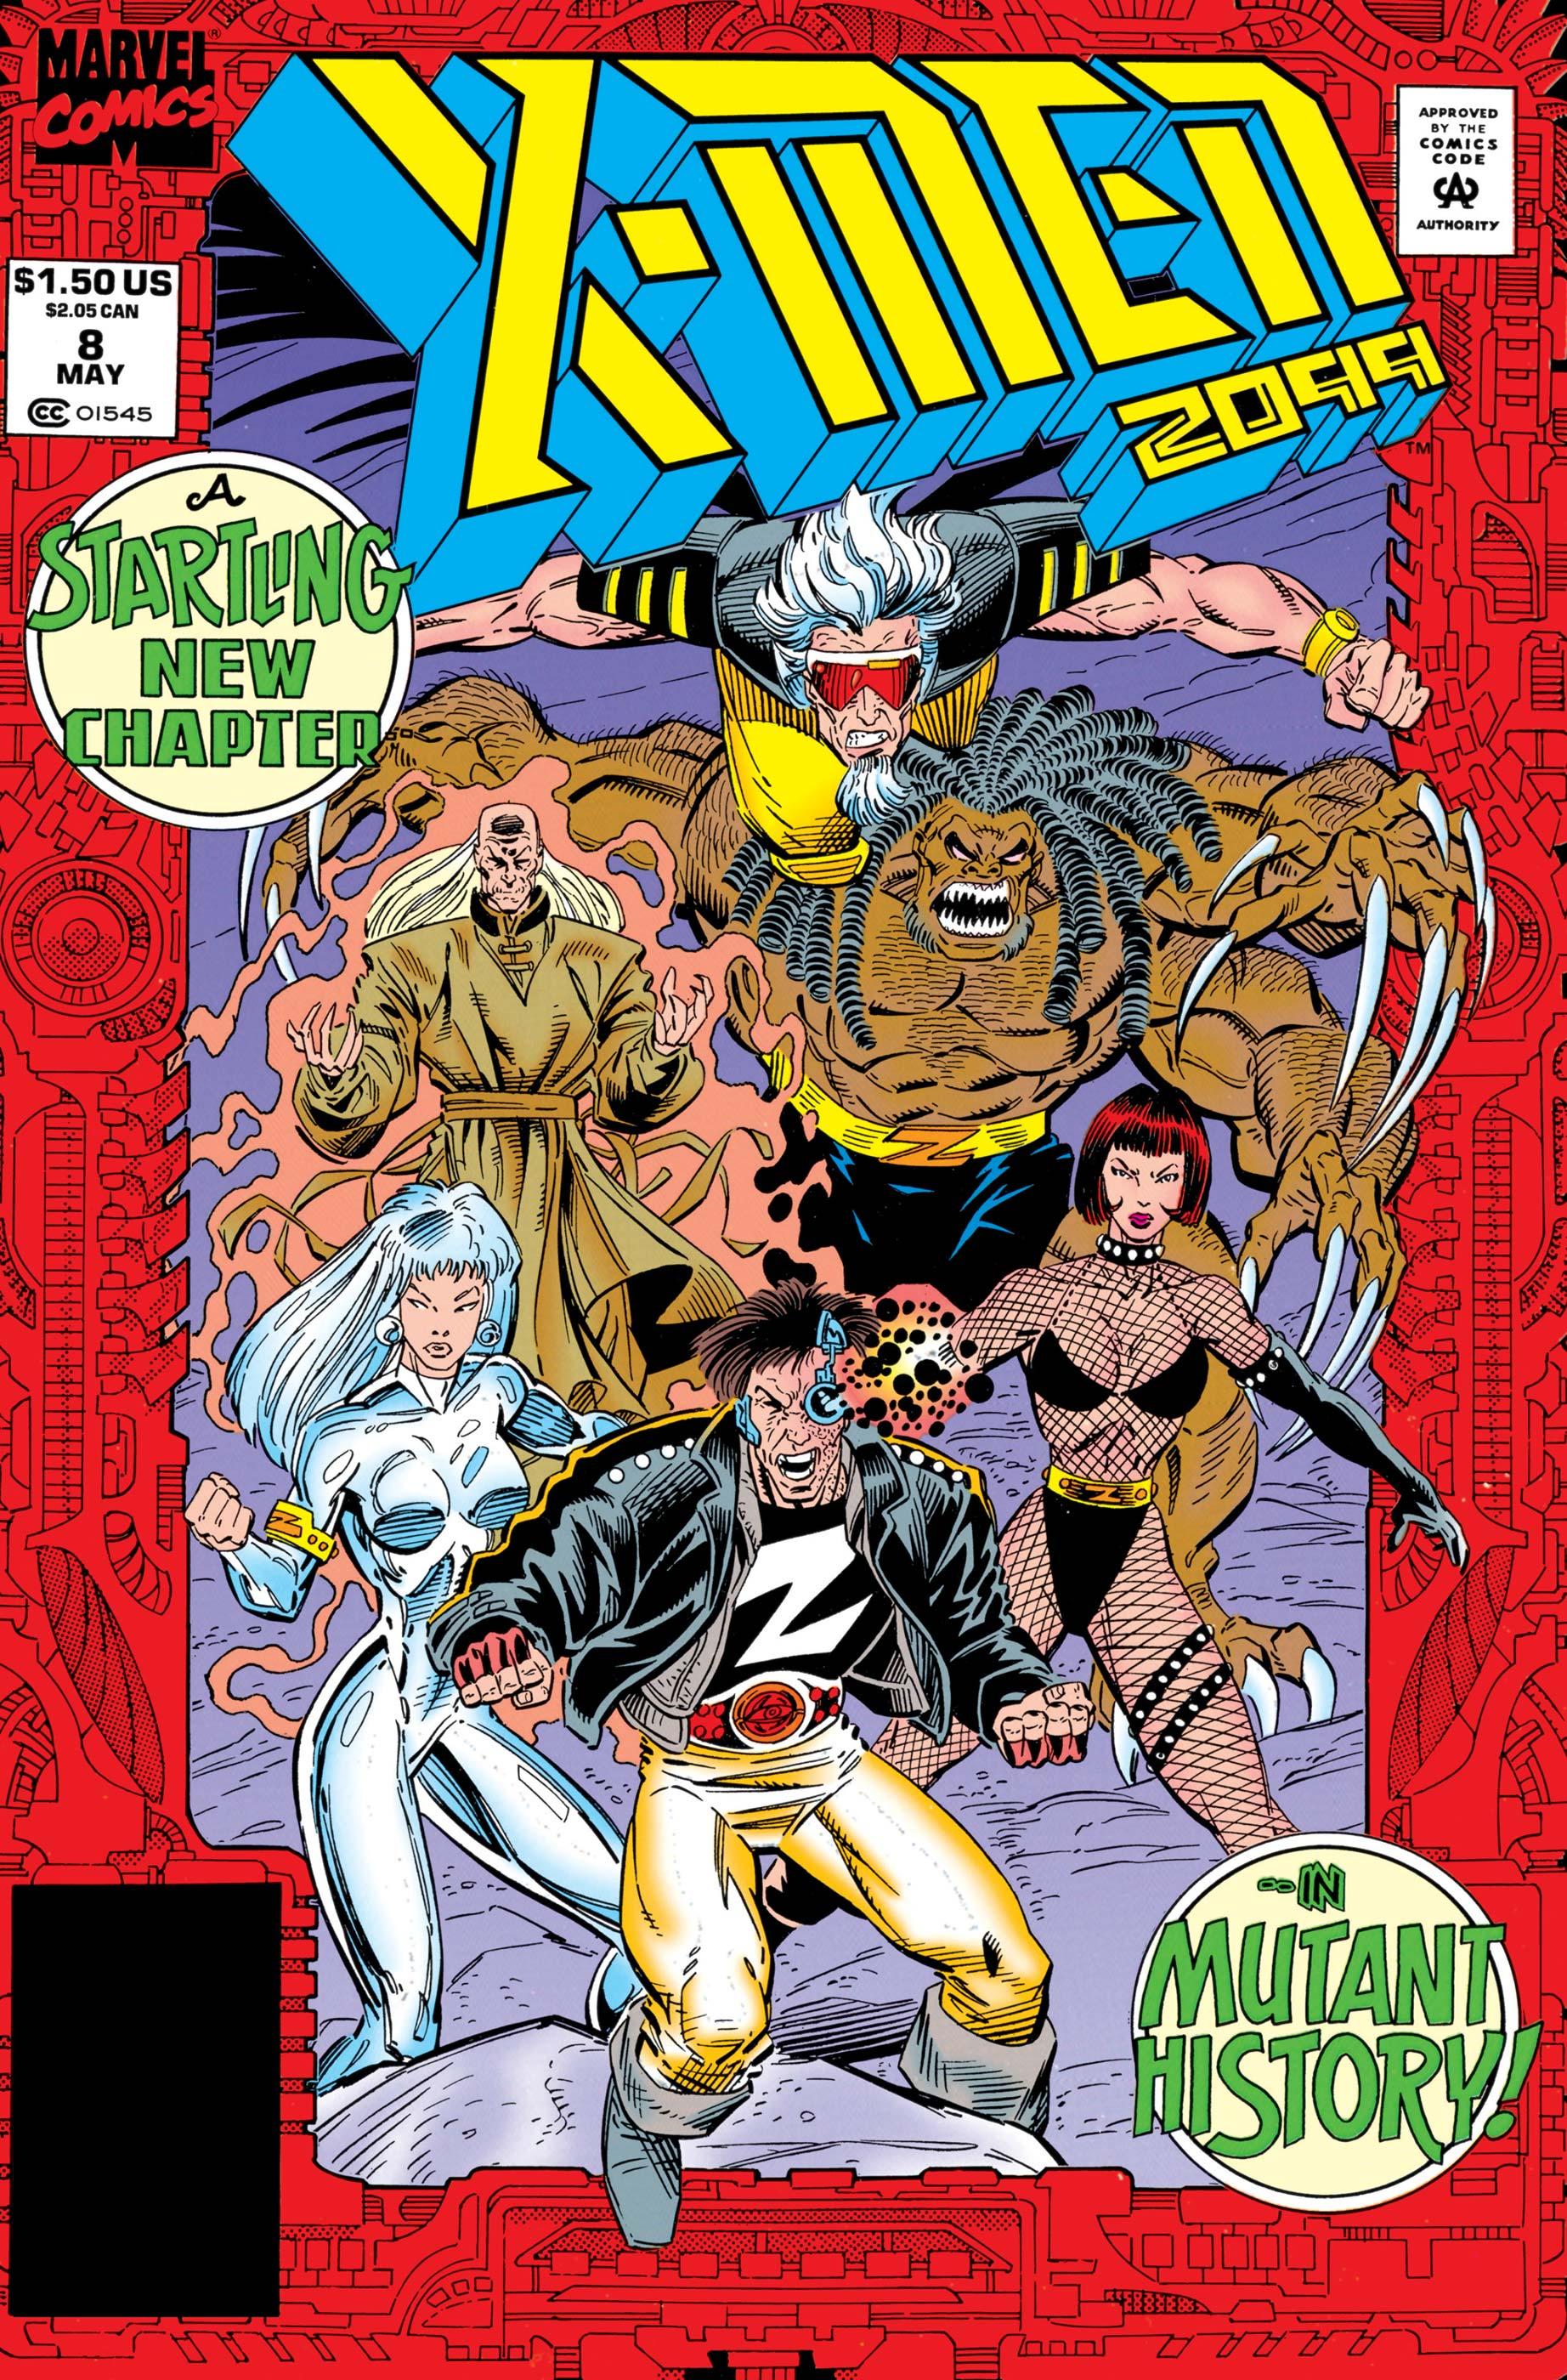 X-Men 2099 (1993) #8